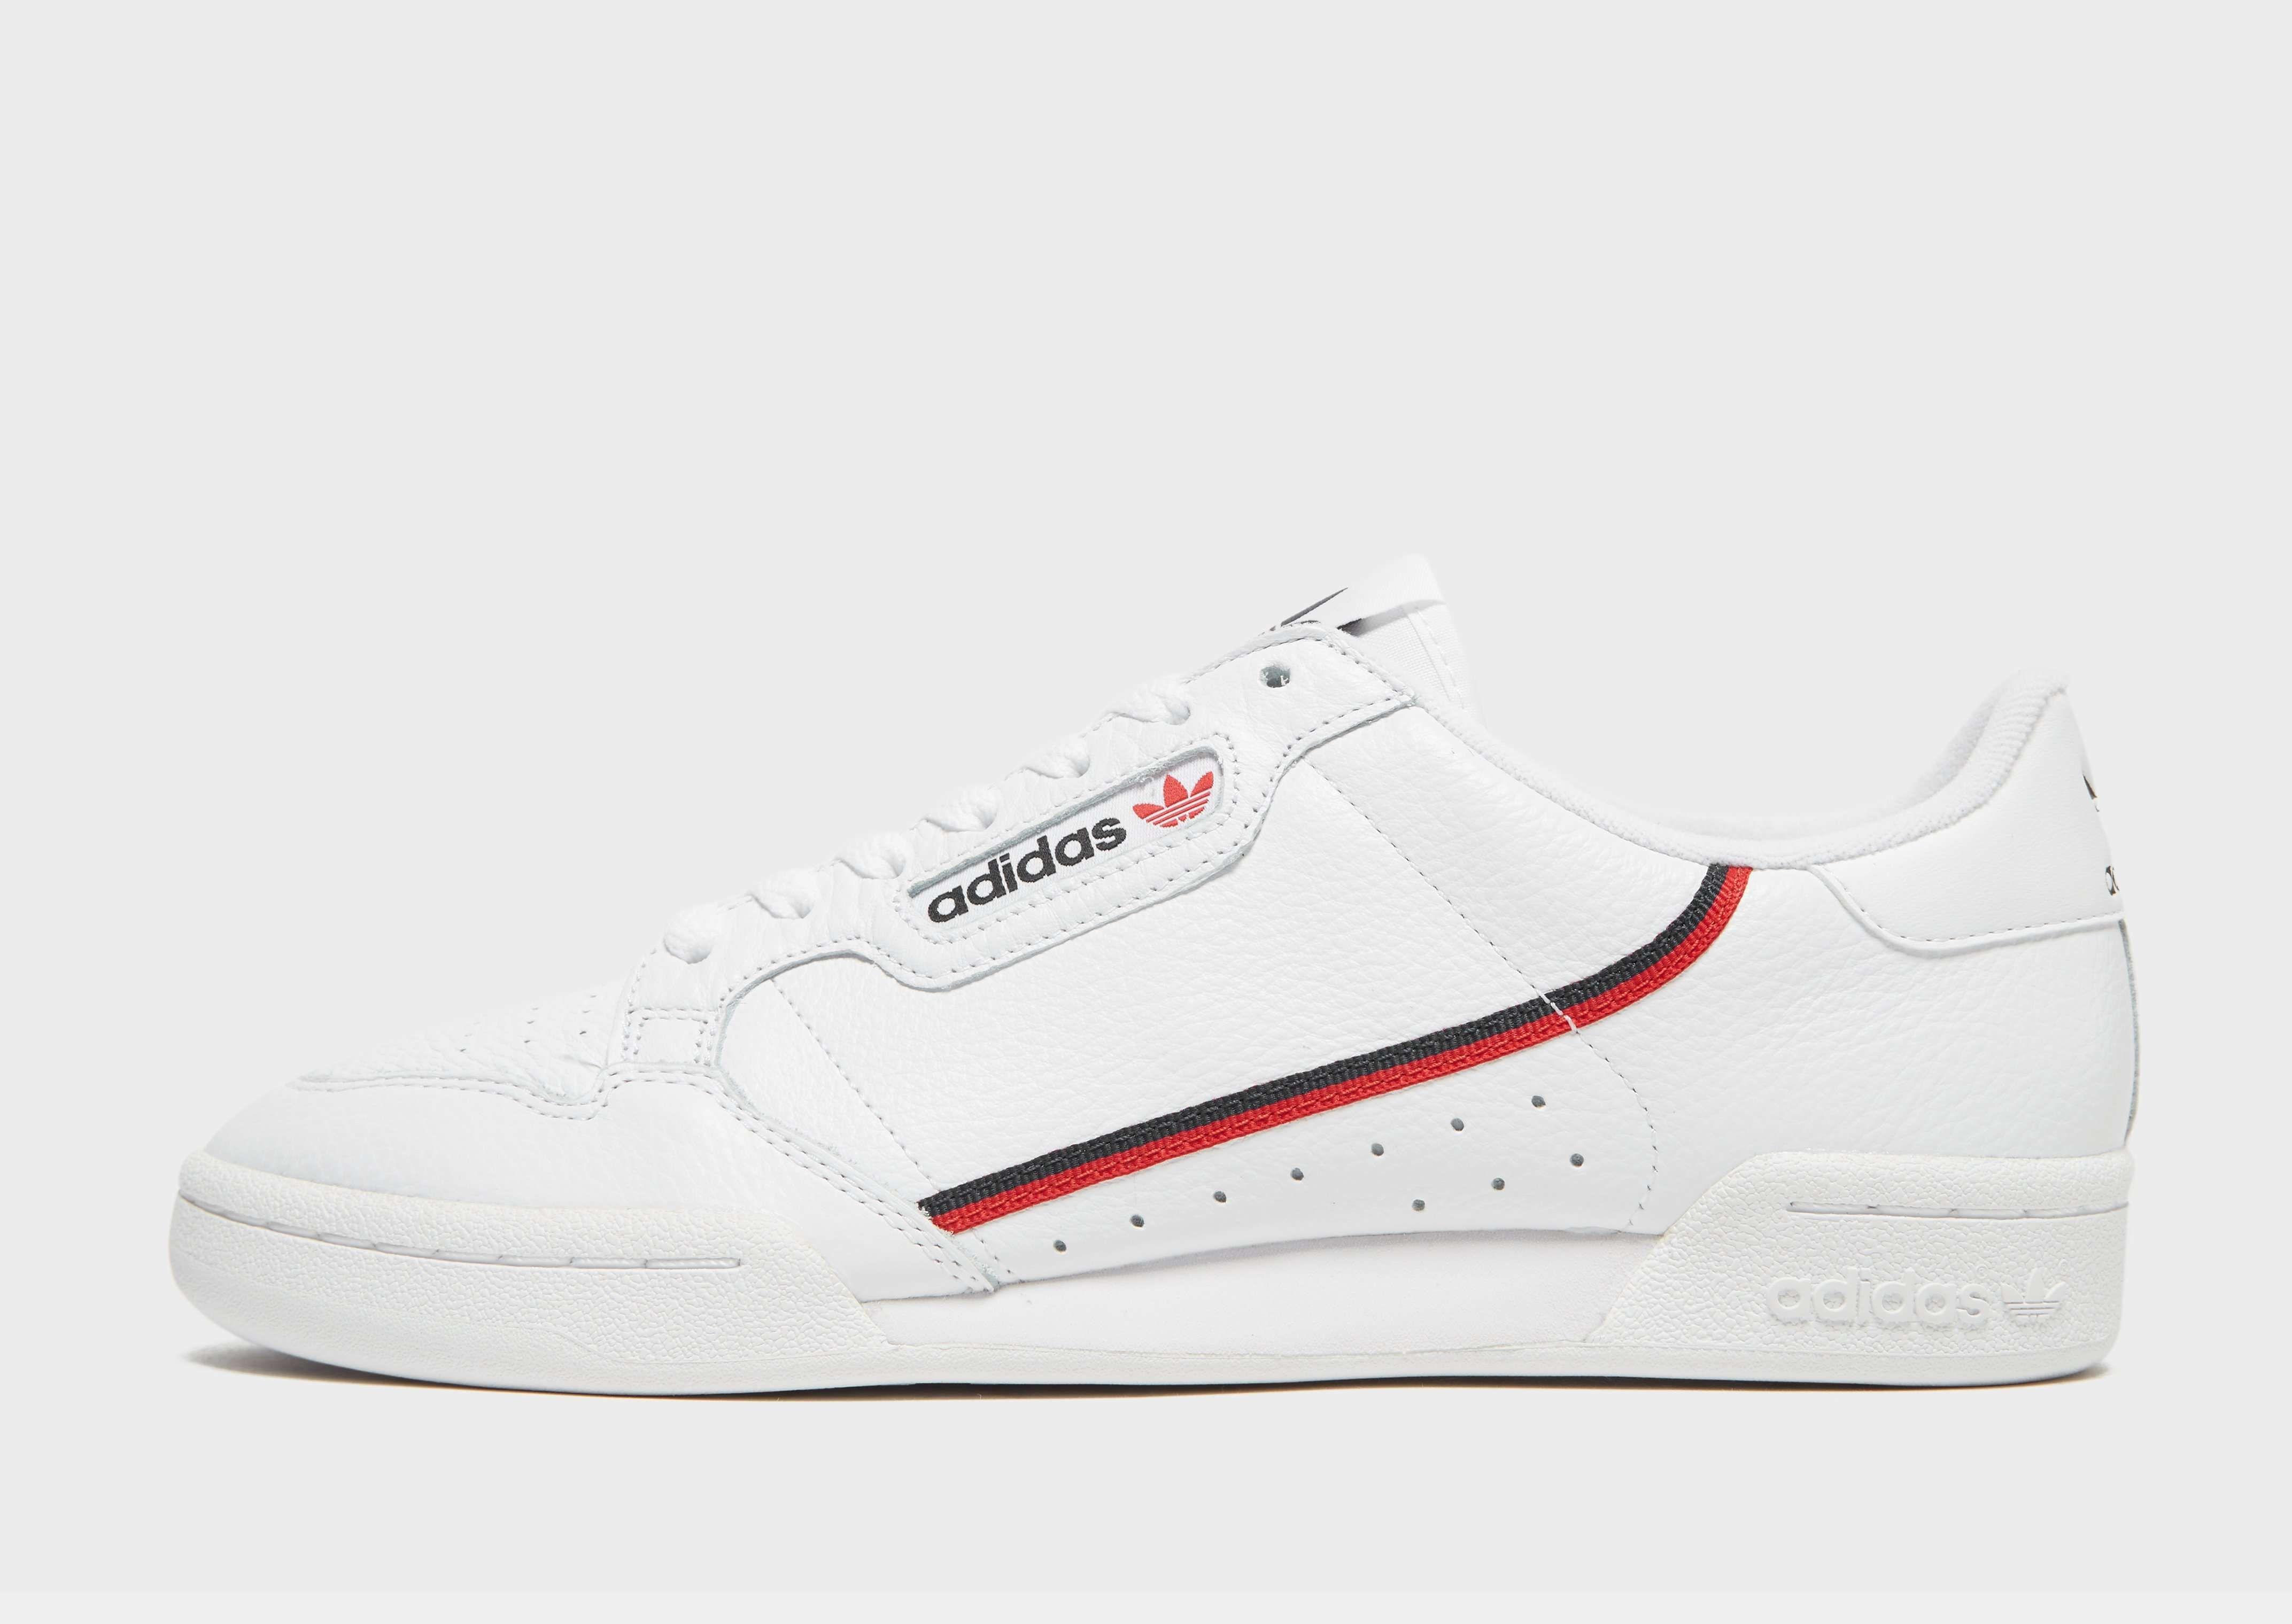 Buy White adidas Originals Continental 80 in 2020 White